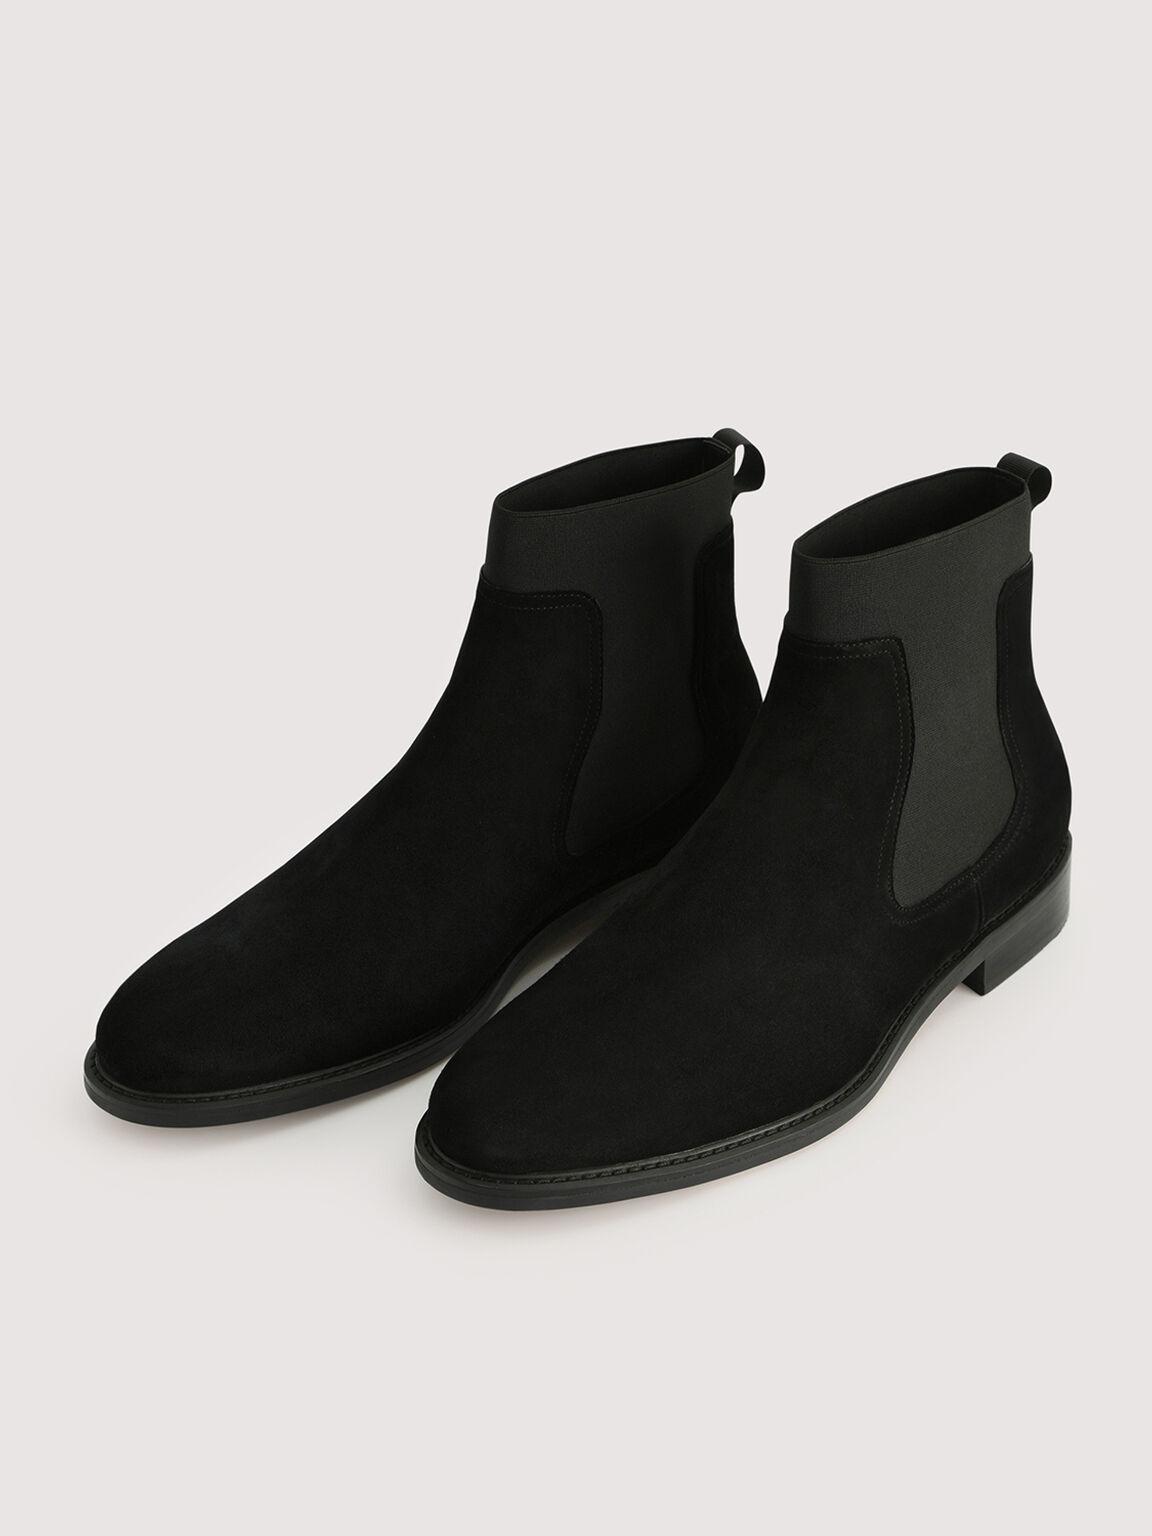 Suede Chelsea Boots, Black, hi-res